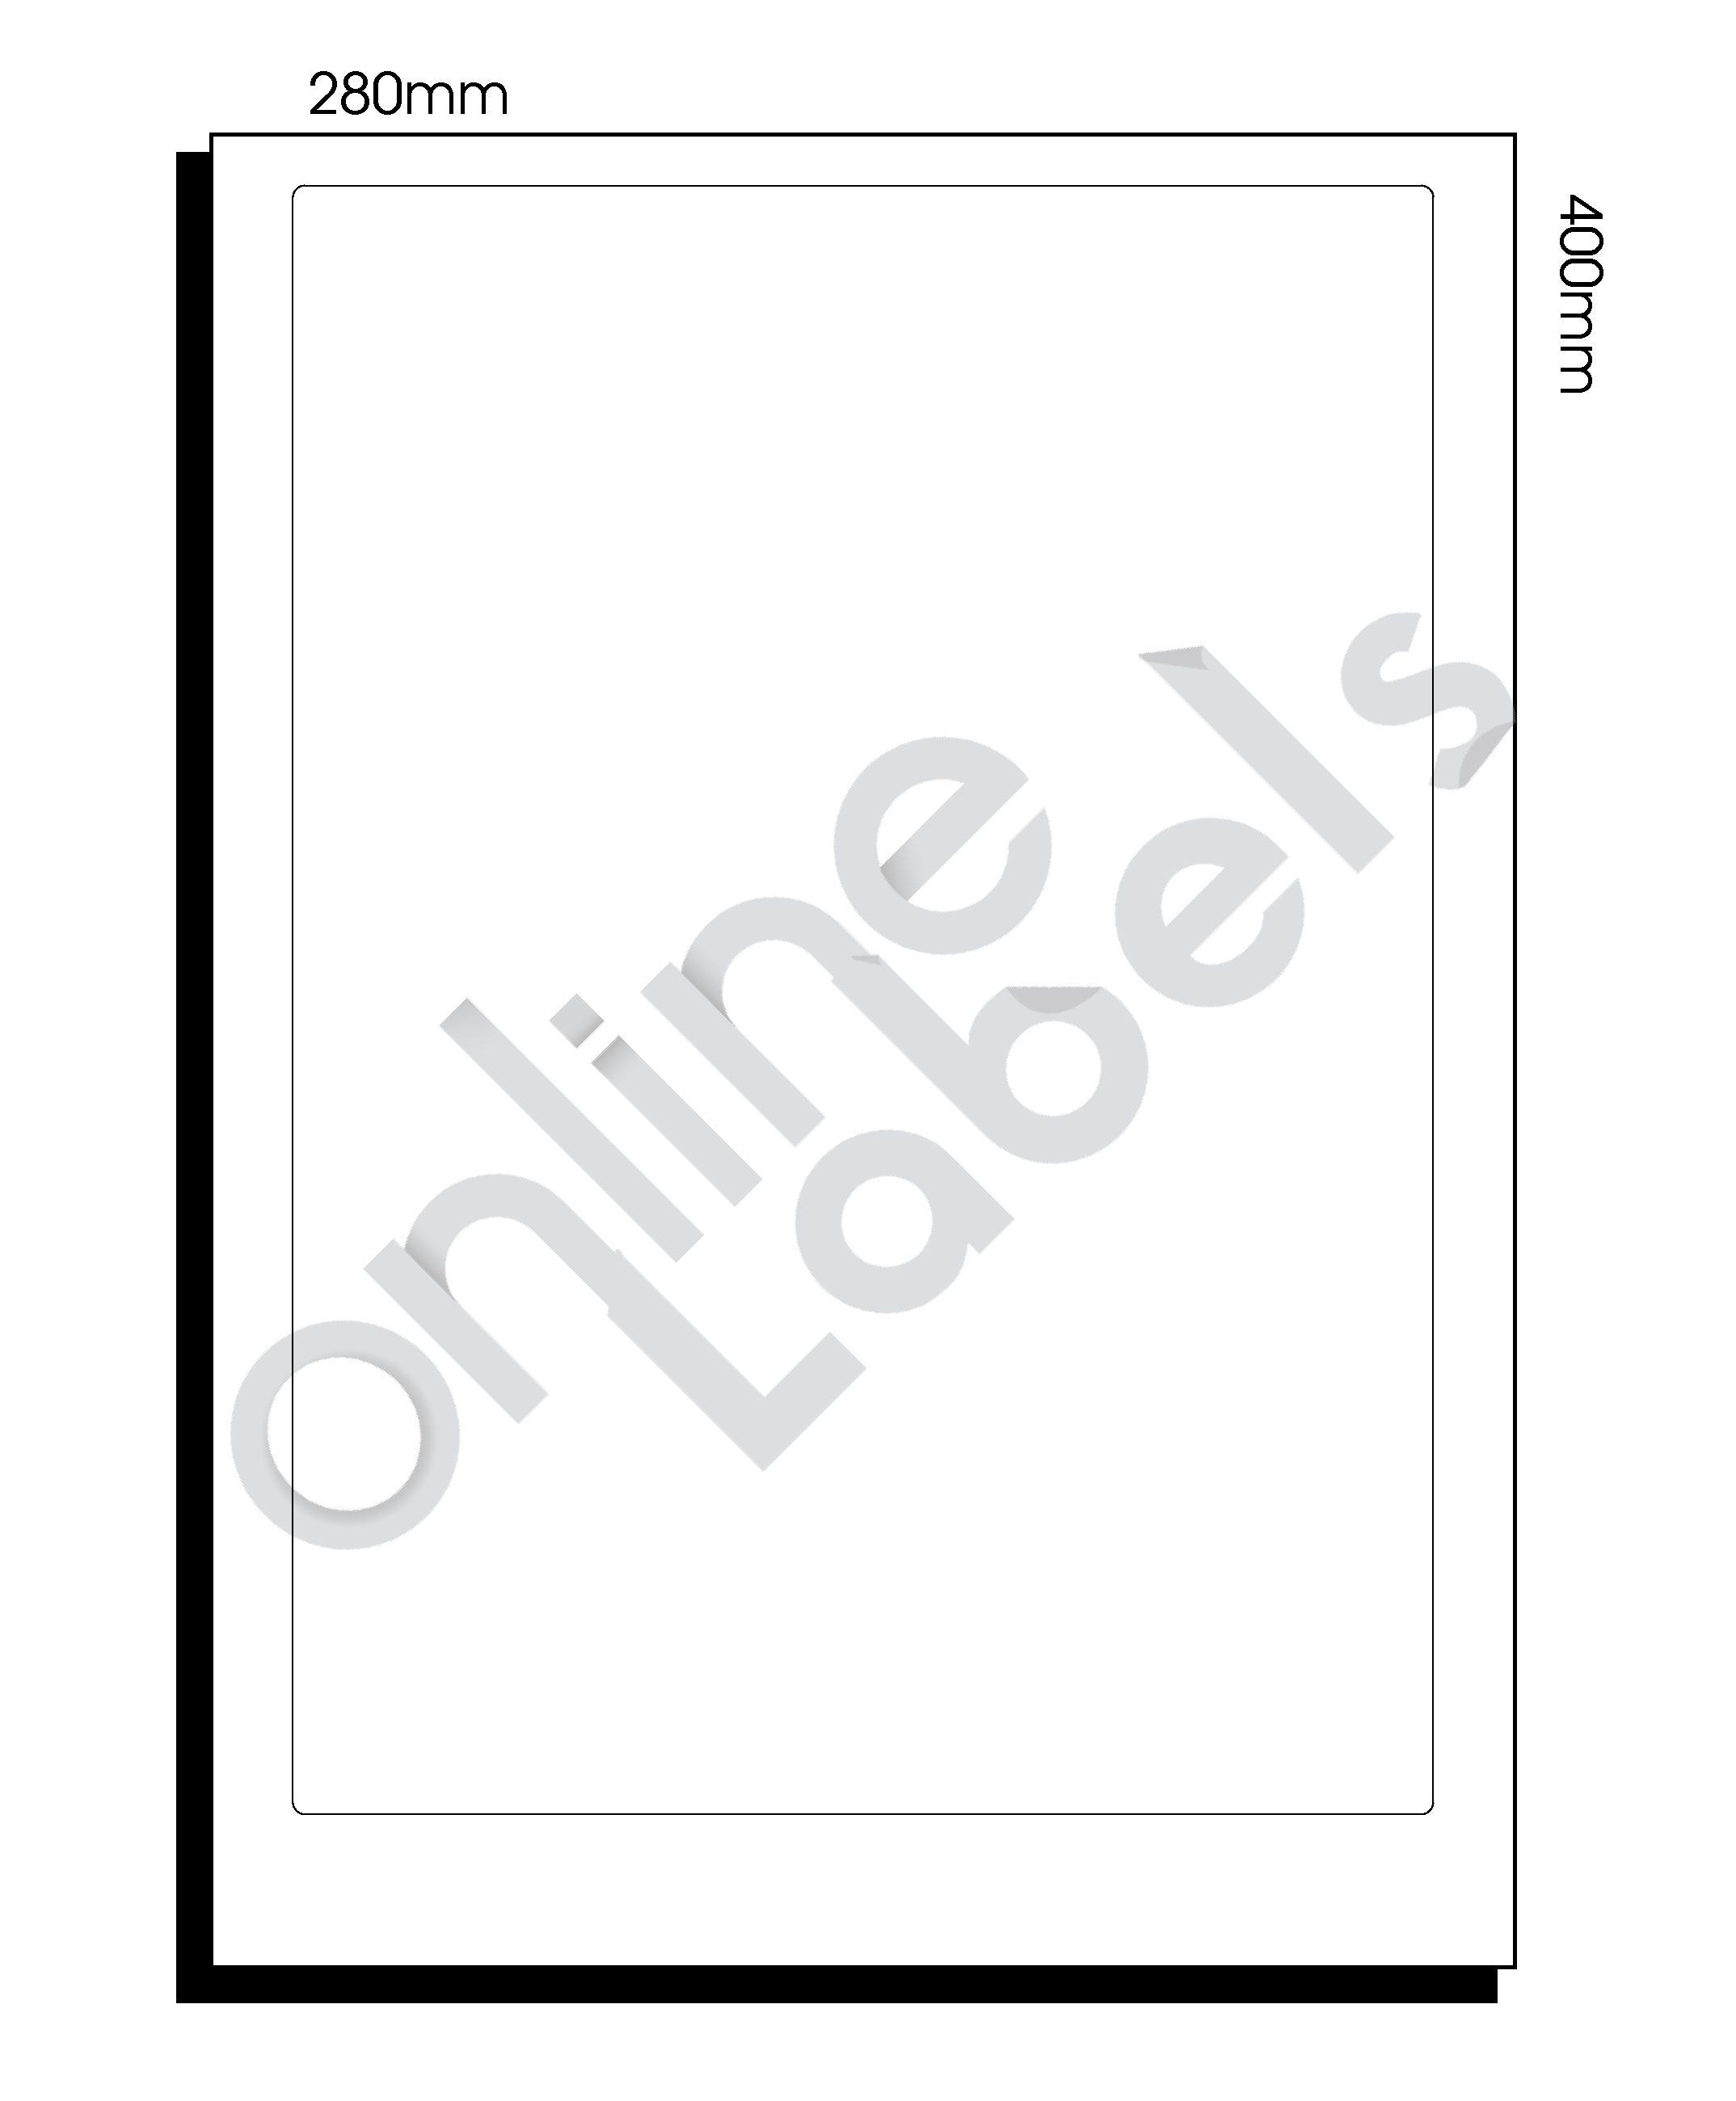 SR-A3 Diecut Labels – 280mm x 400mm